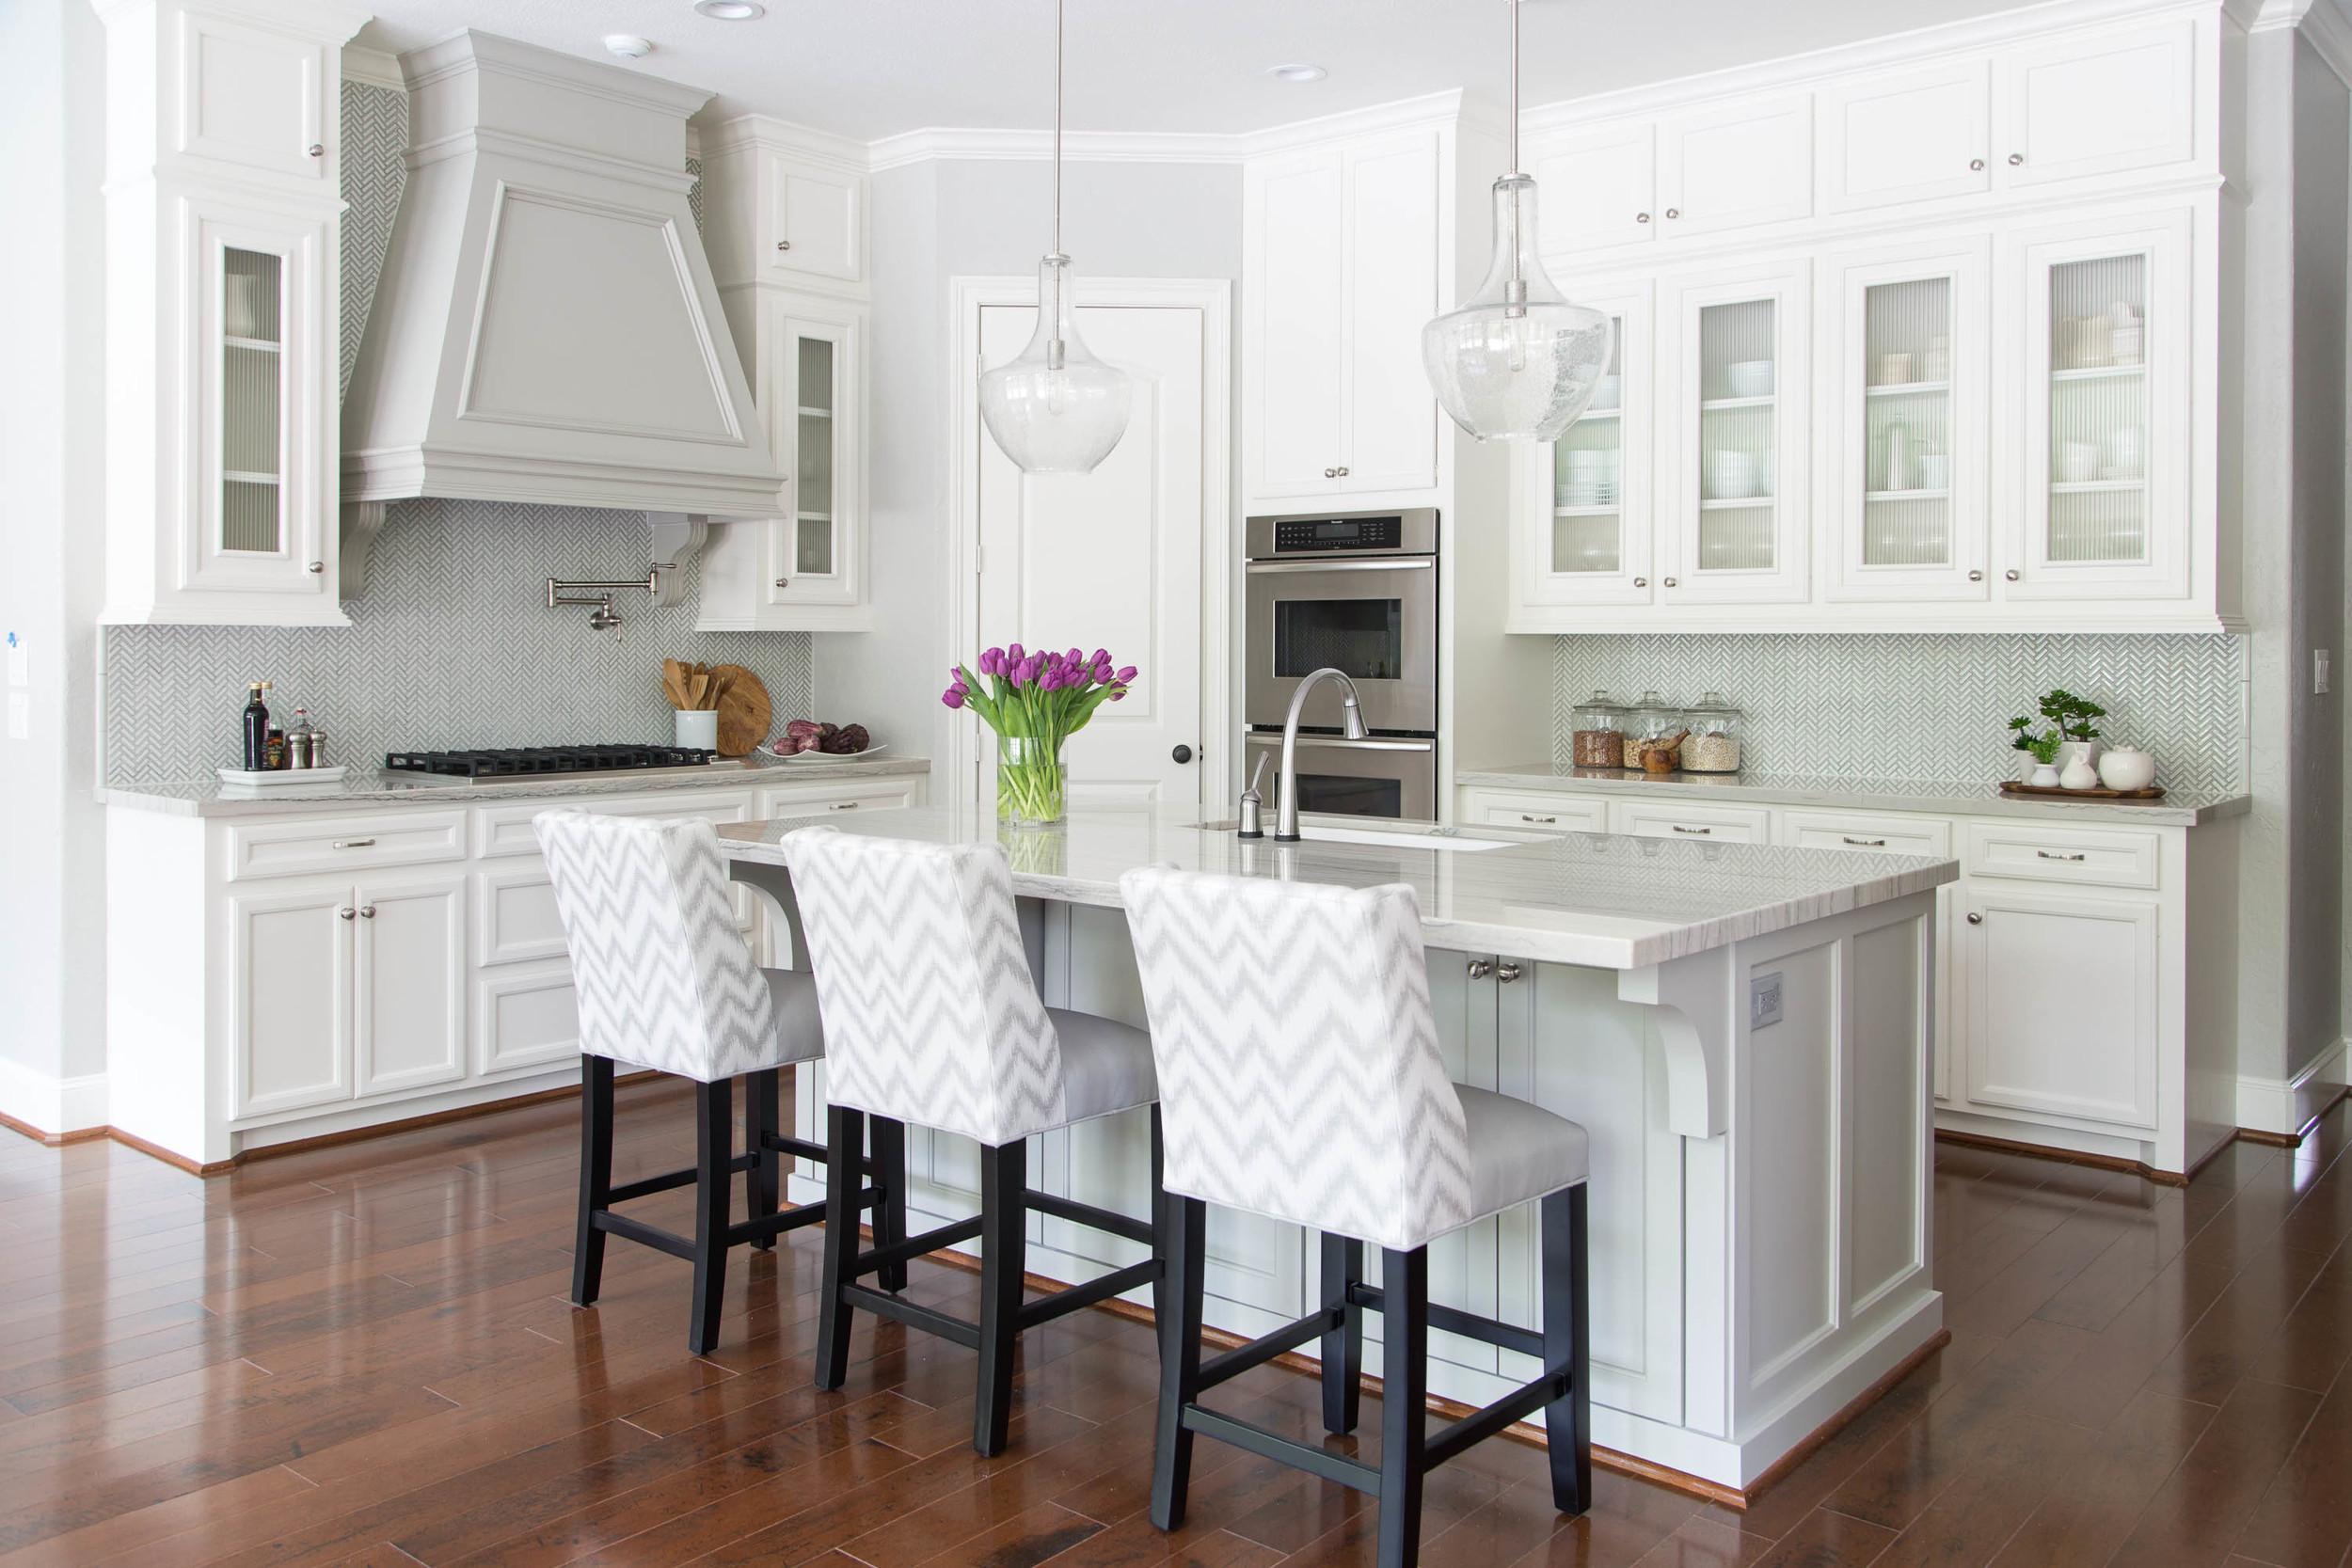 Grey and white kitchen remodel, Designer: Carla Aston